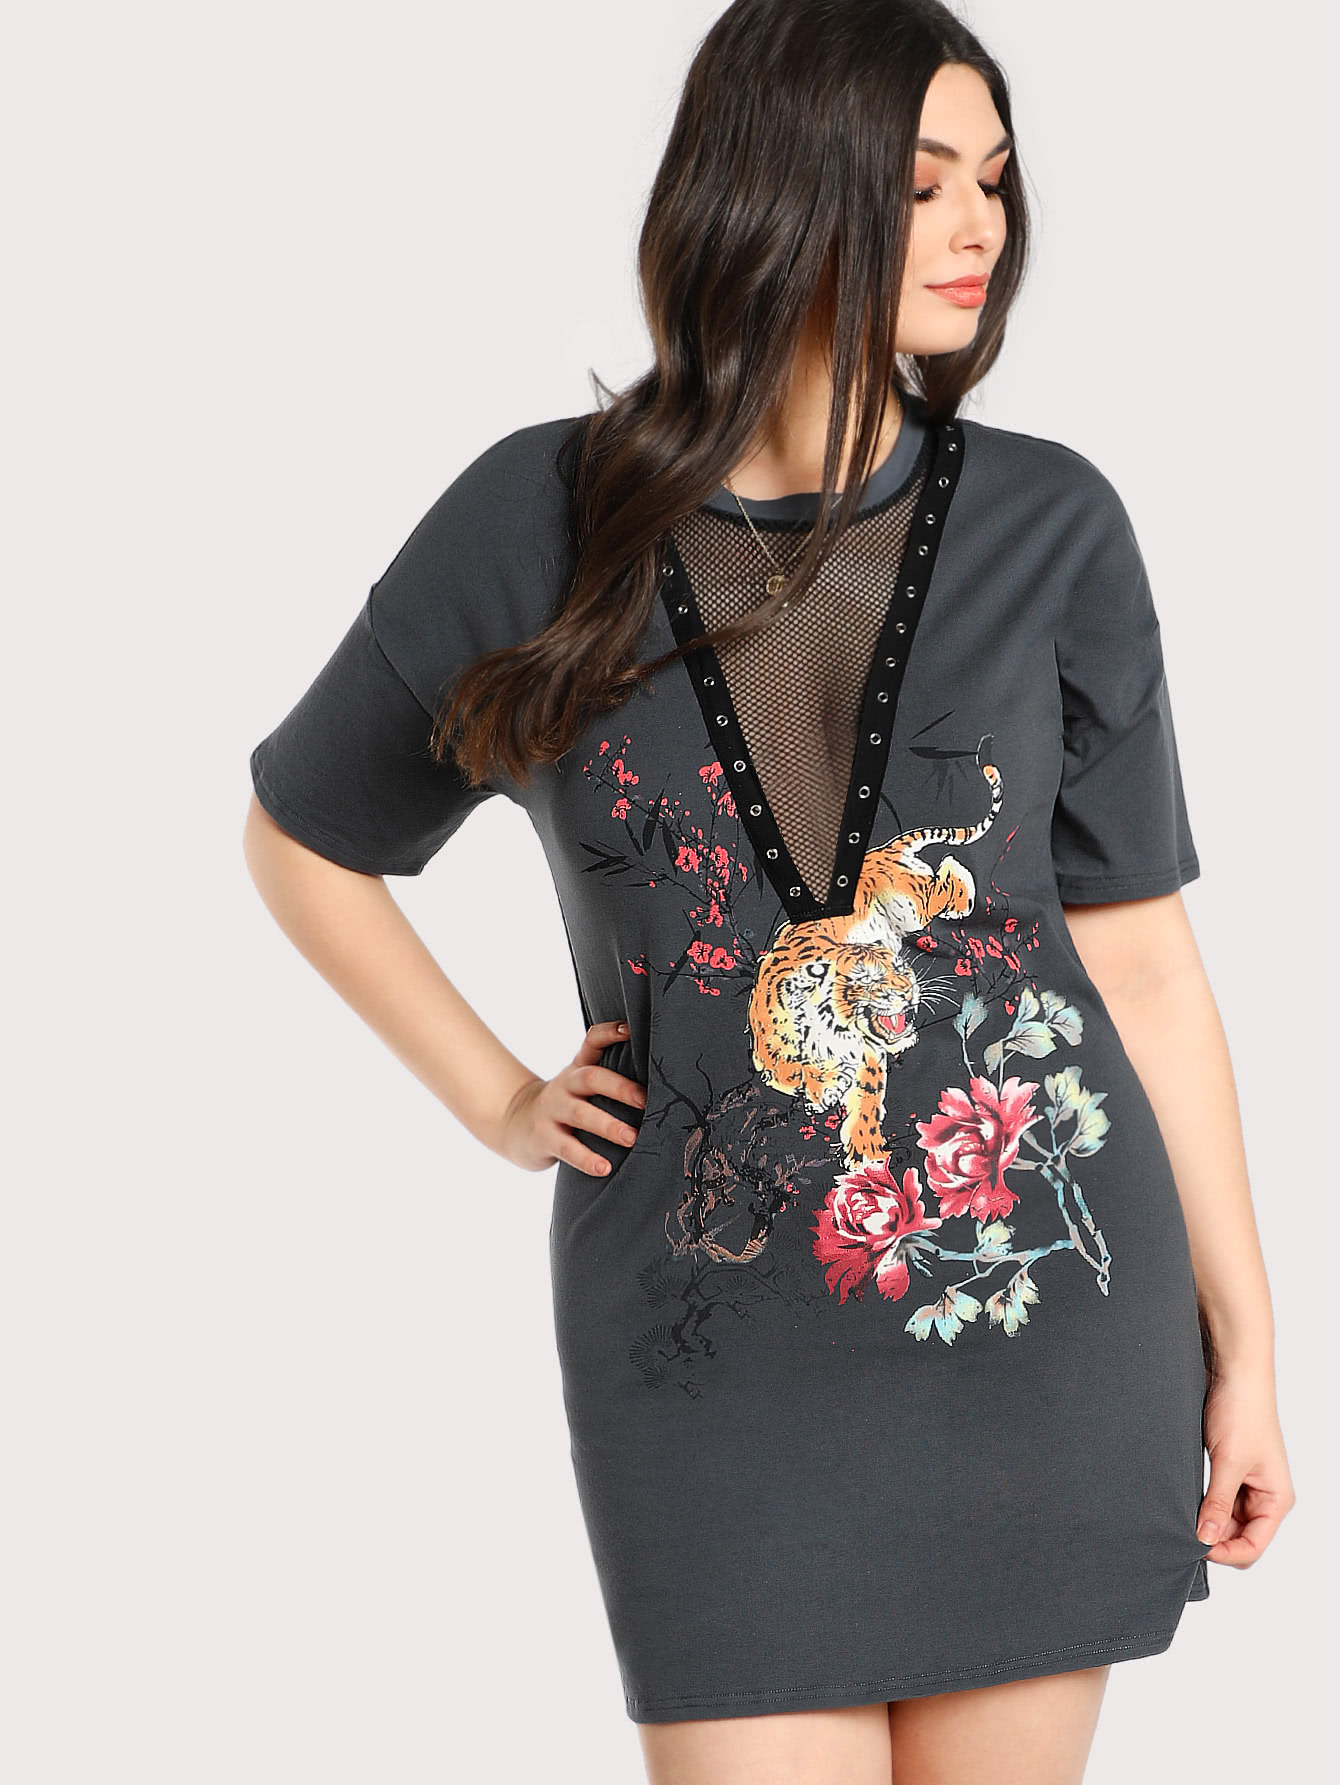 Grommet Detail Mesh V-Neck Graphic Dress metal grommet detail drop shoulder sweatshirt dress